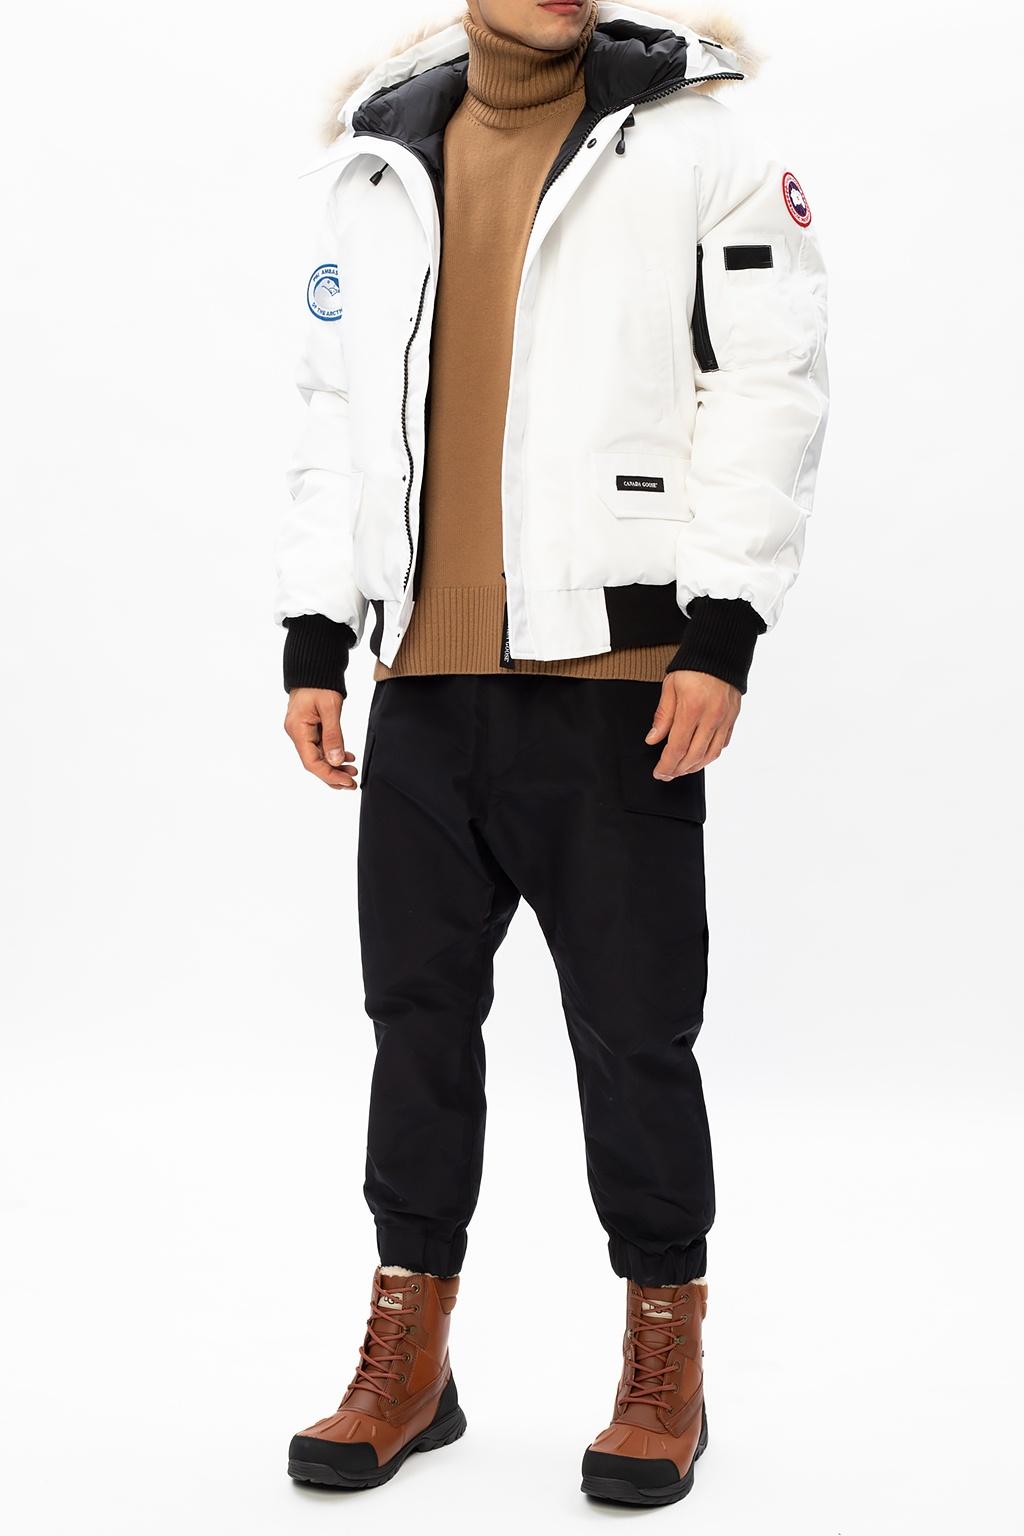 Canada Goose 'Chilliwack' down jacket